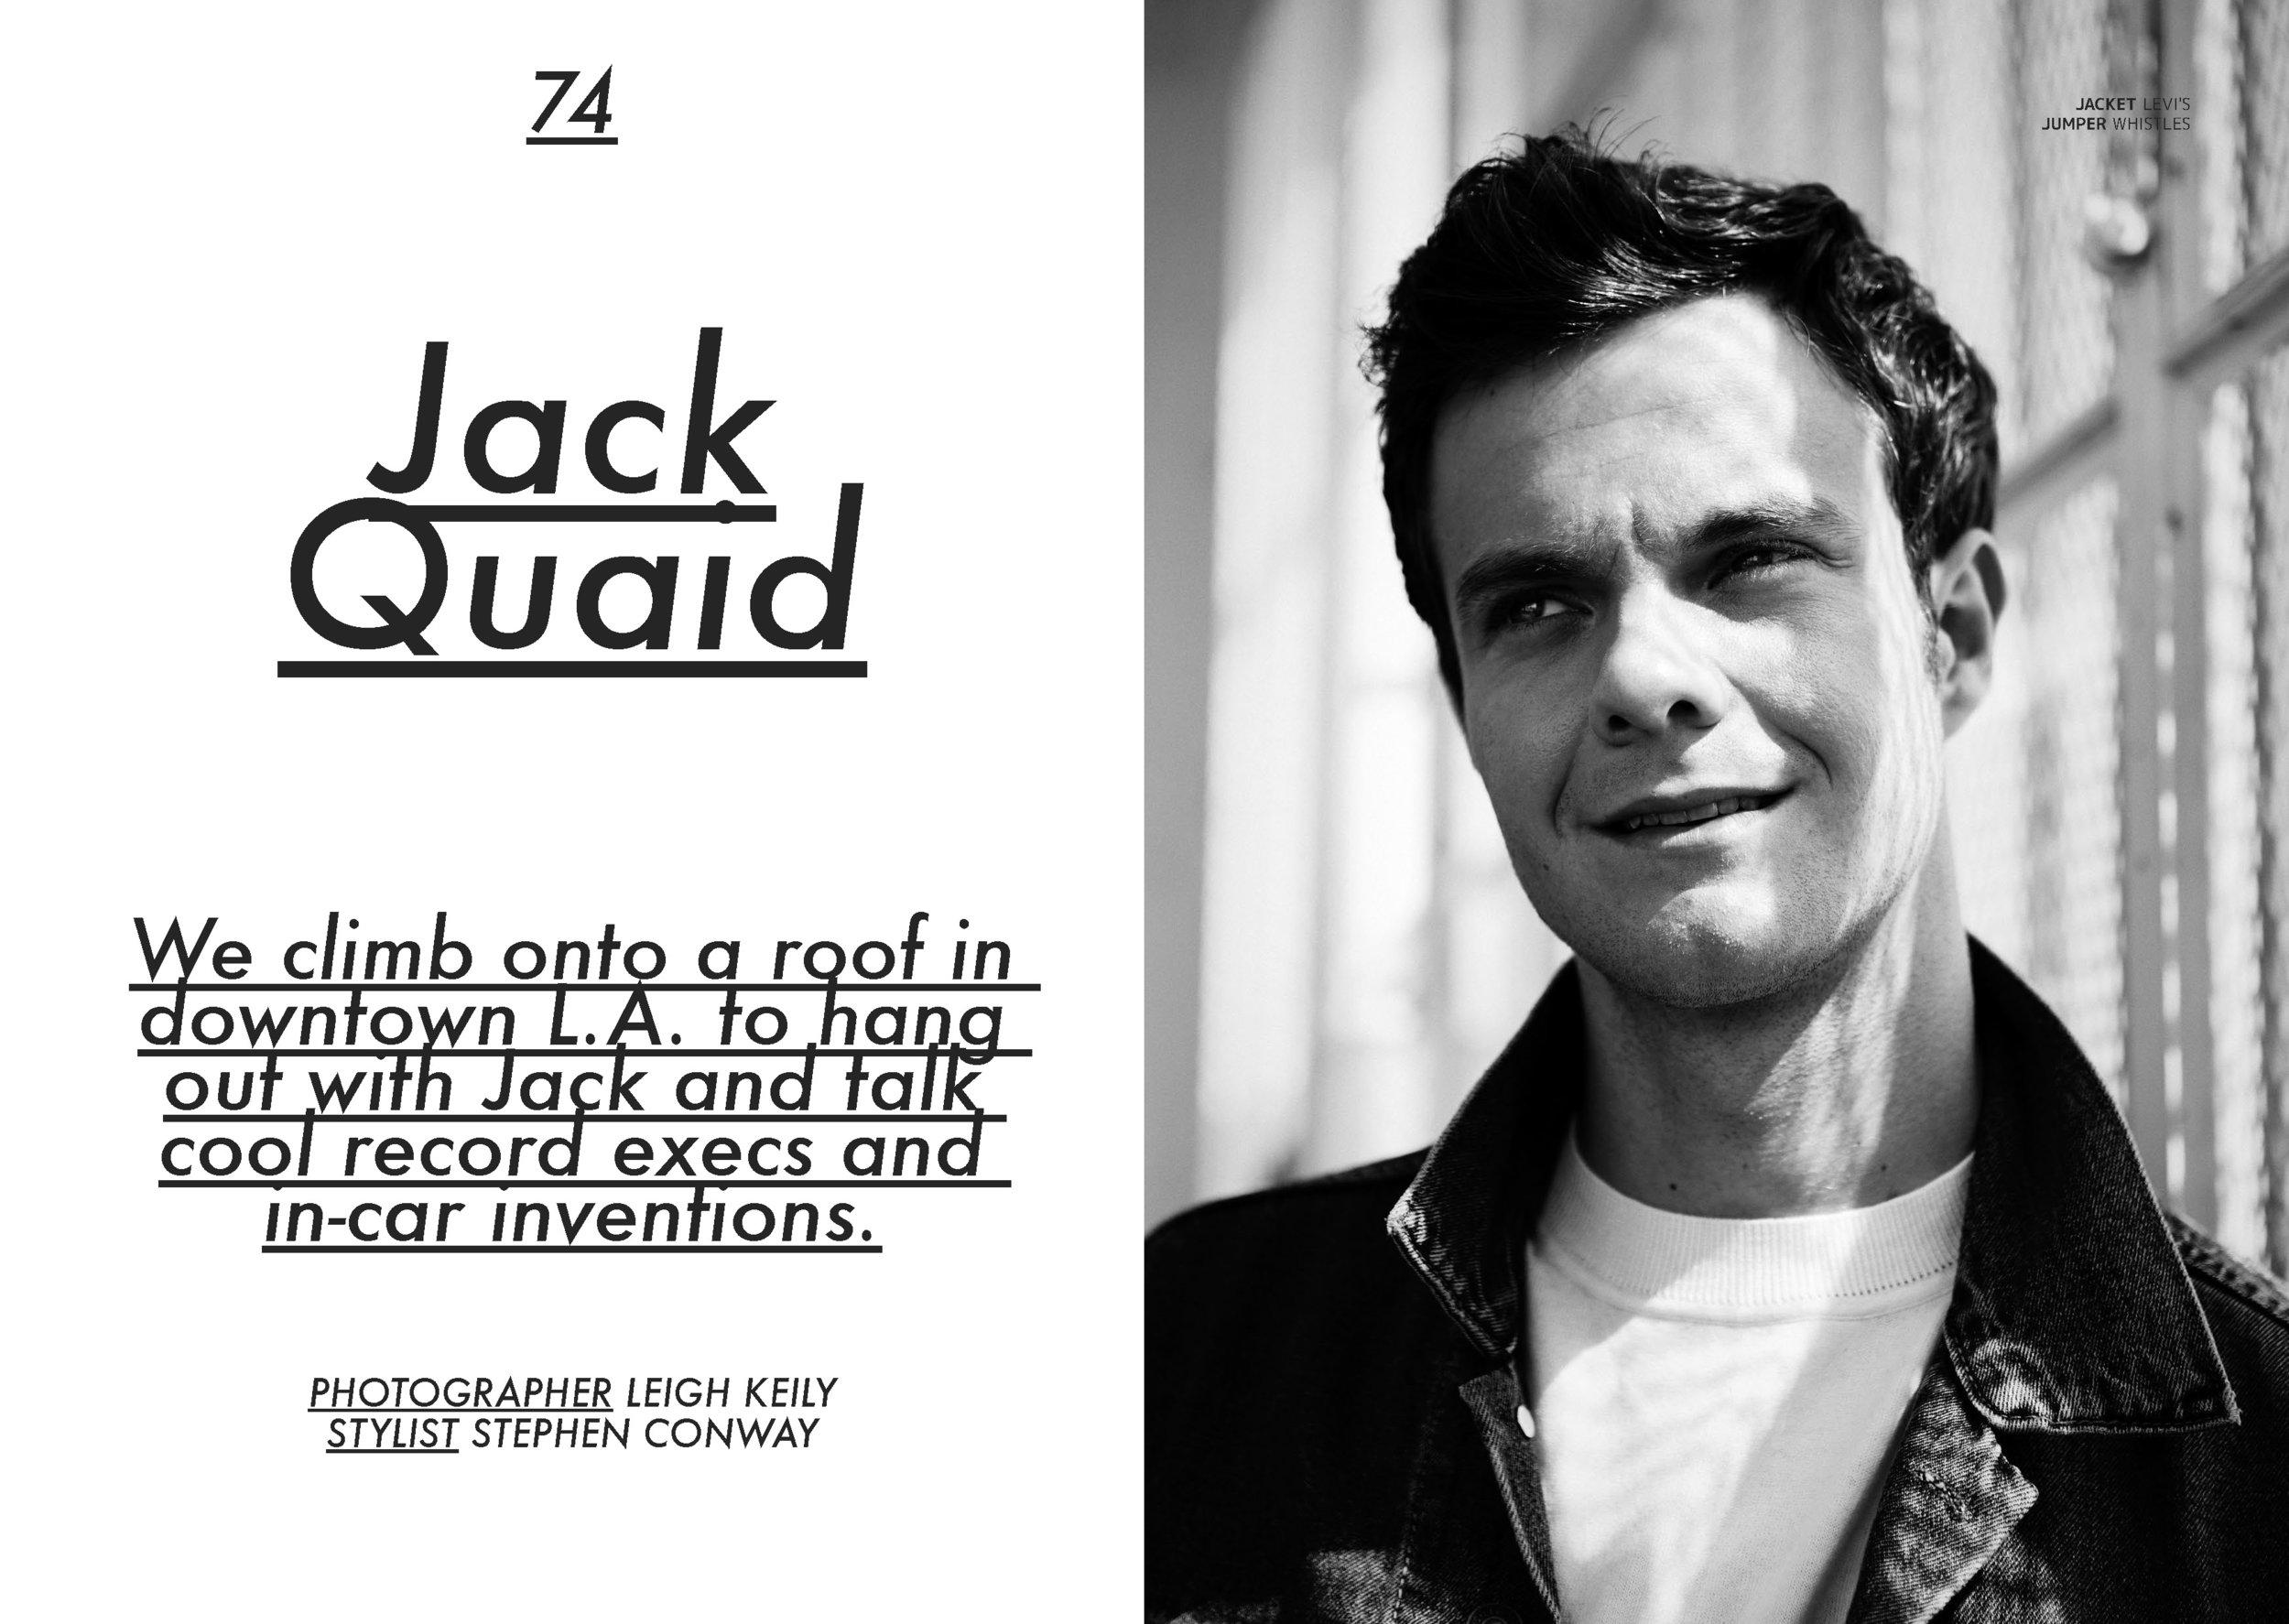 JON_NEW_JACK-QUAID_Page_01.jpg